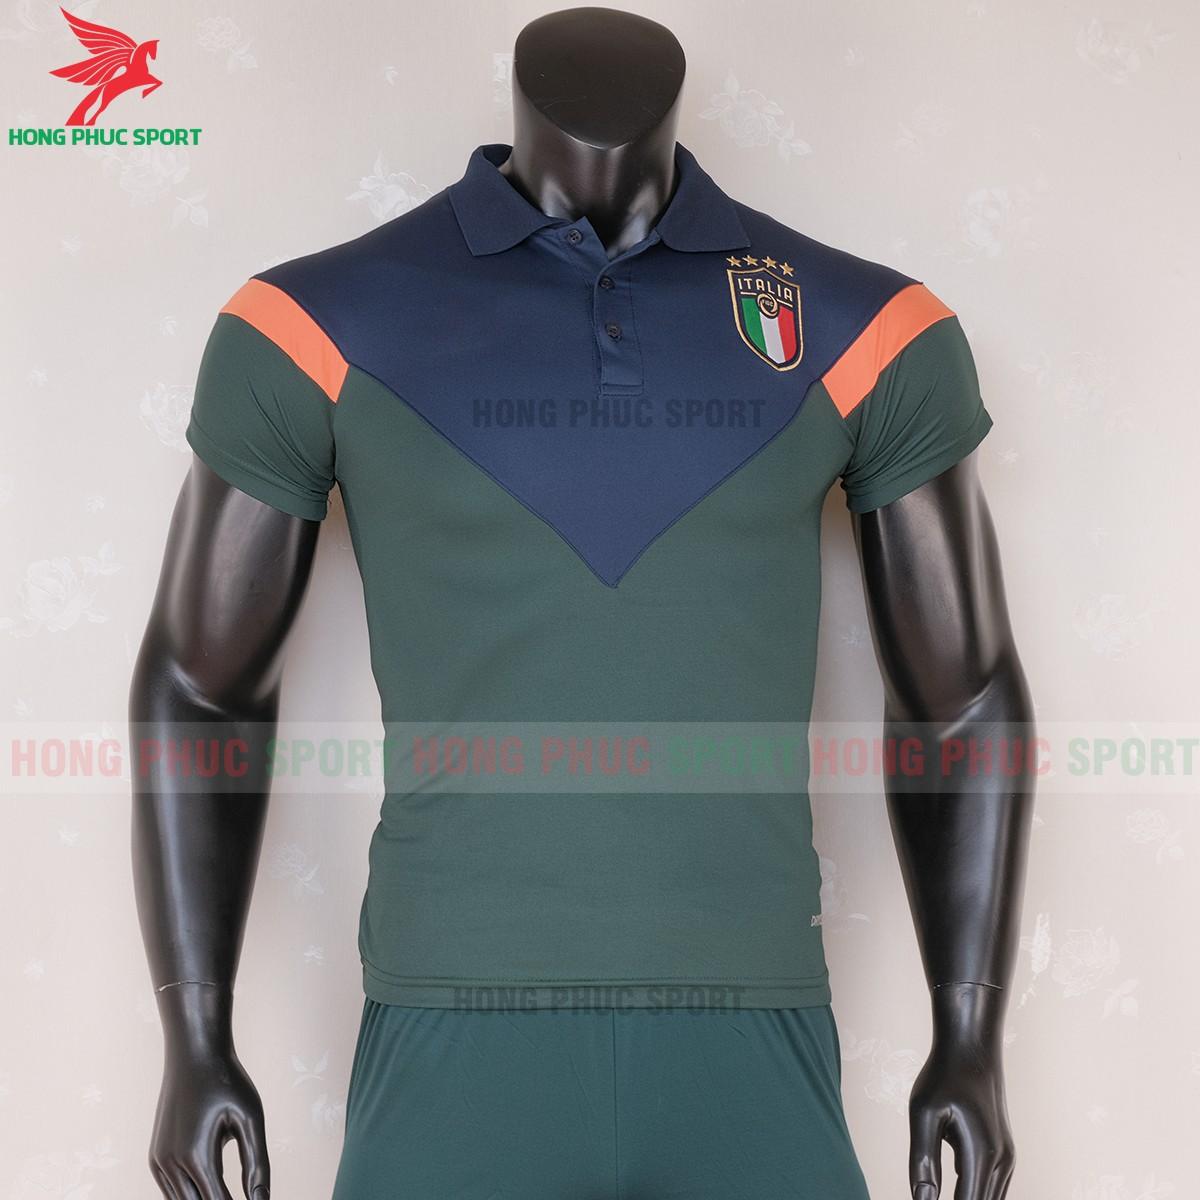 https://cdn.hongphucsport.com/unsafe/s4.shopbay.vn/files/285/ao-polo-tuyen-italia-2020-2-5f73e3b1a6037.png